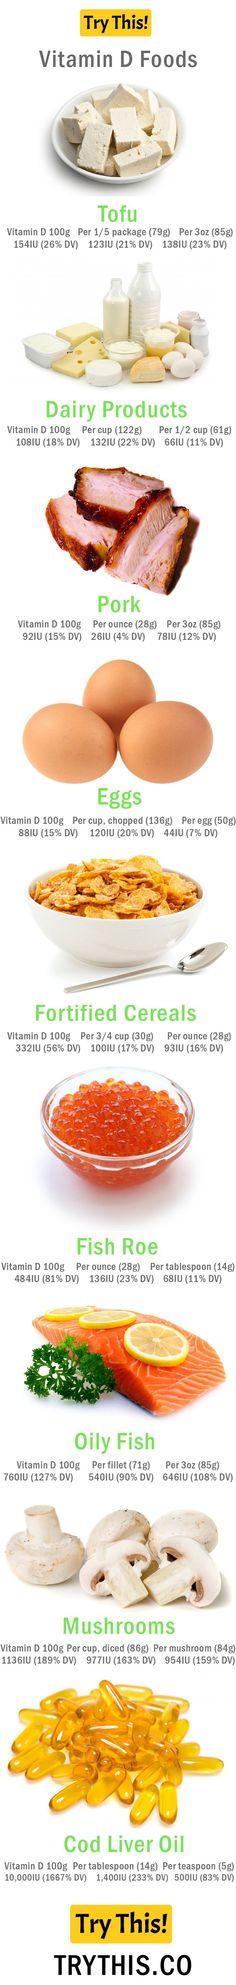 Vitamin D Foods: Top Foods Highest in Vitamin D #followback #F4F #instafollow #tagforlikes #vitamins